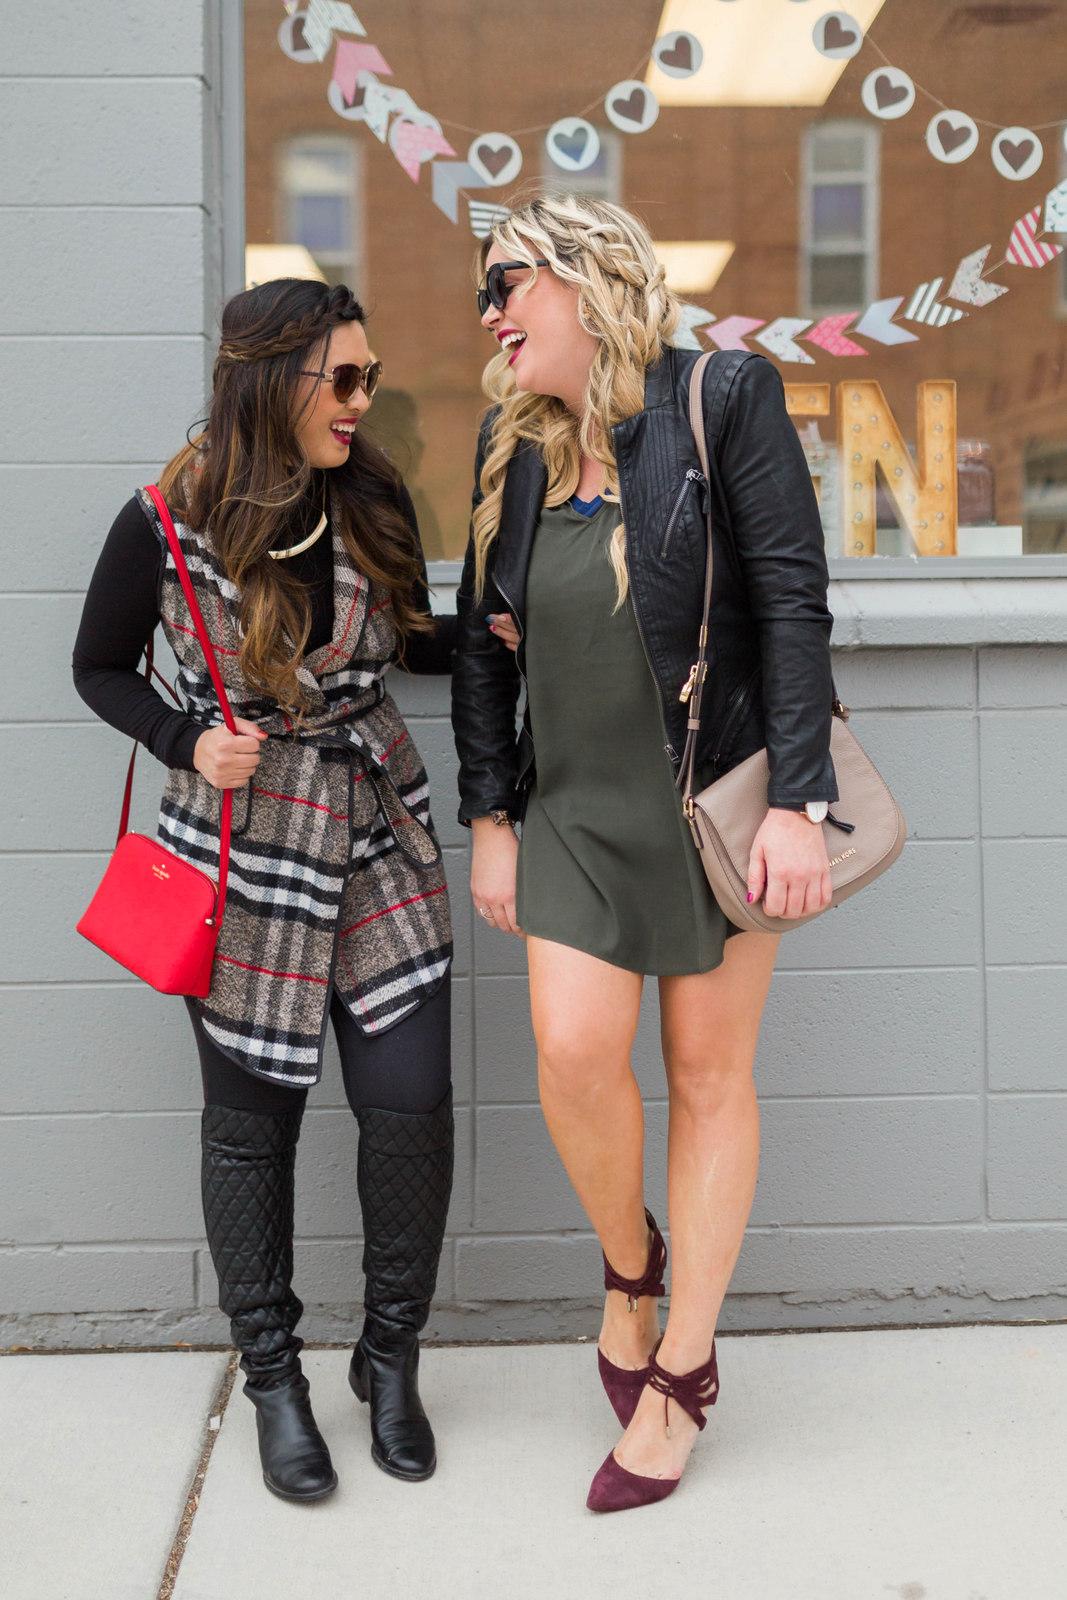 Fashion blogger laugh